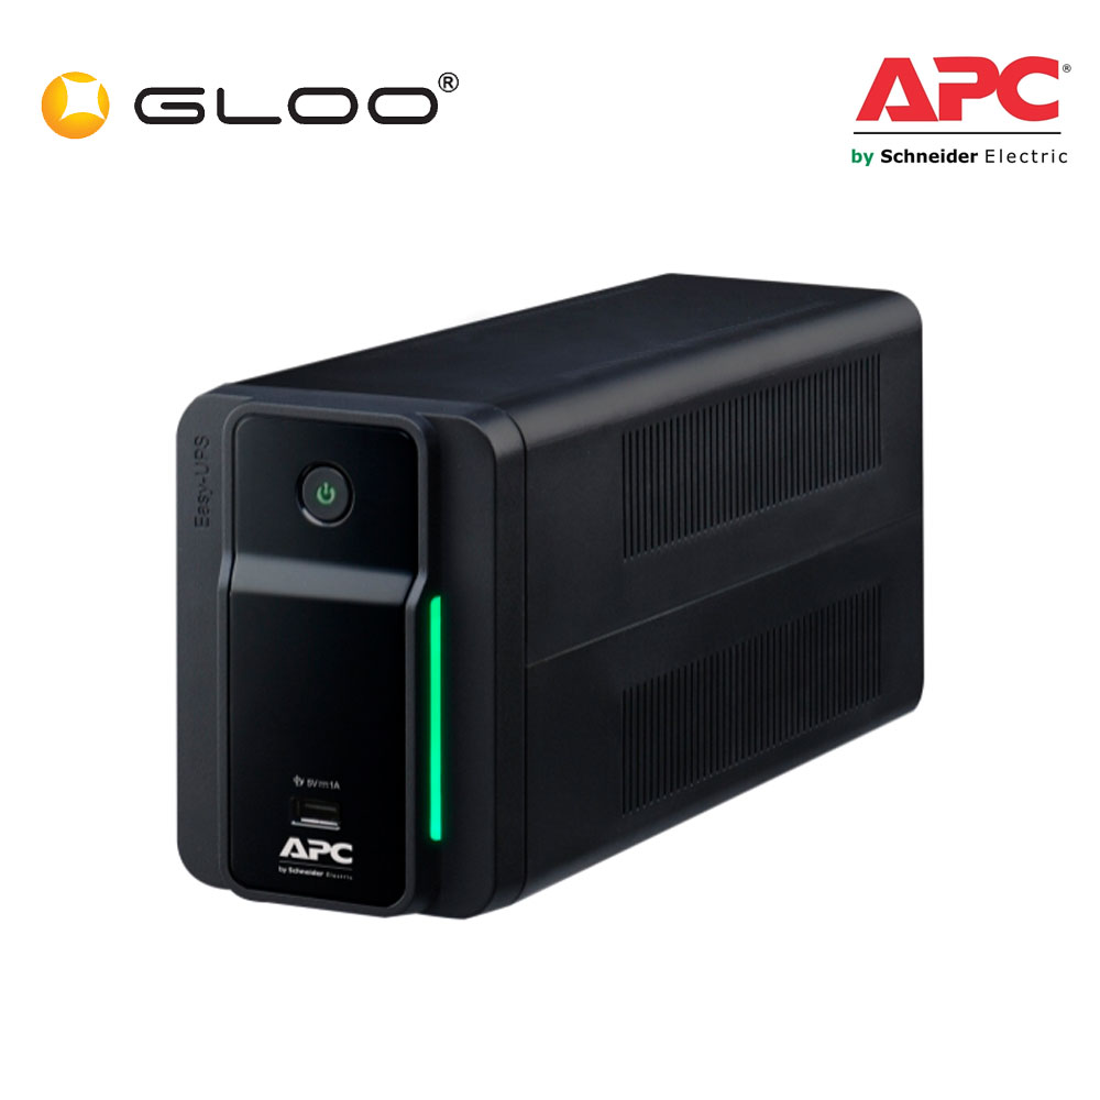 APC Easy UPS BVX 700VA, 230V, AVR, USB Charging, Universal Sockets BVX700LUI-MS - Black